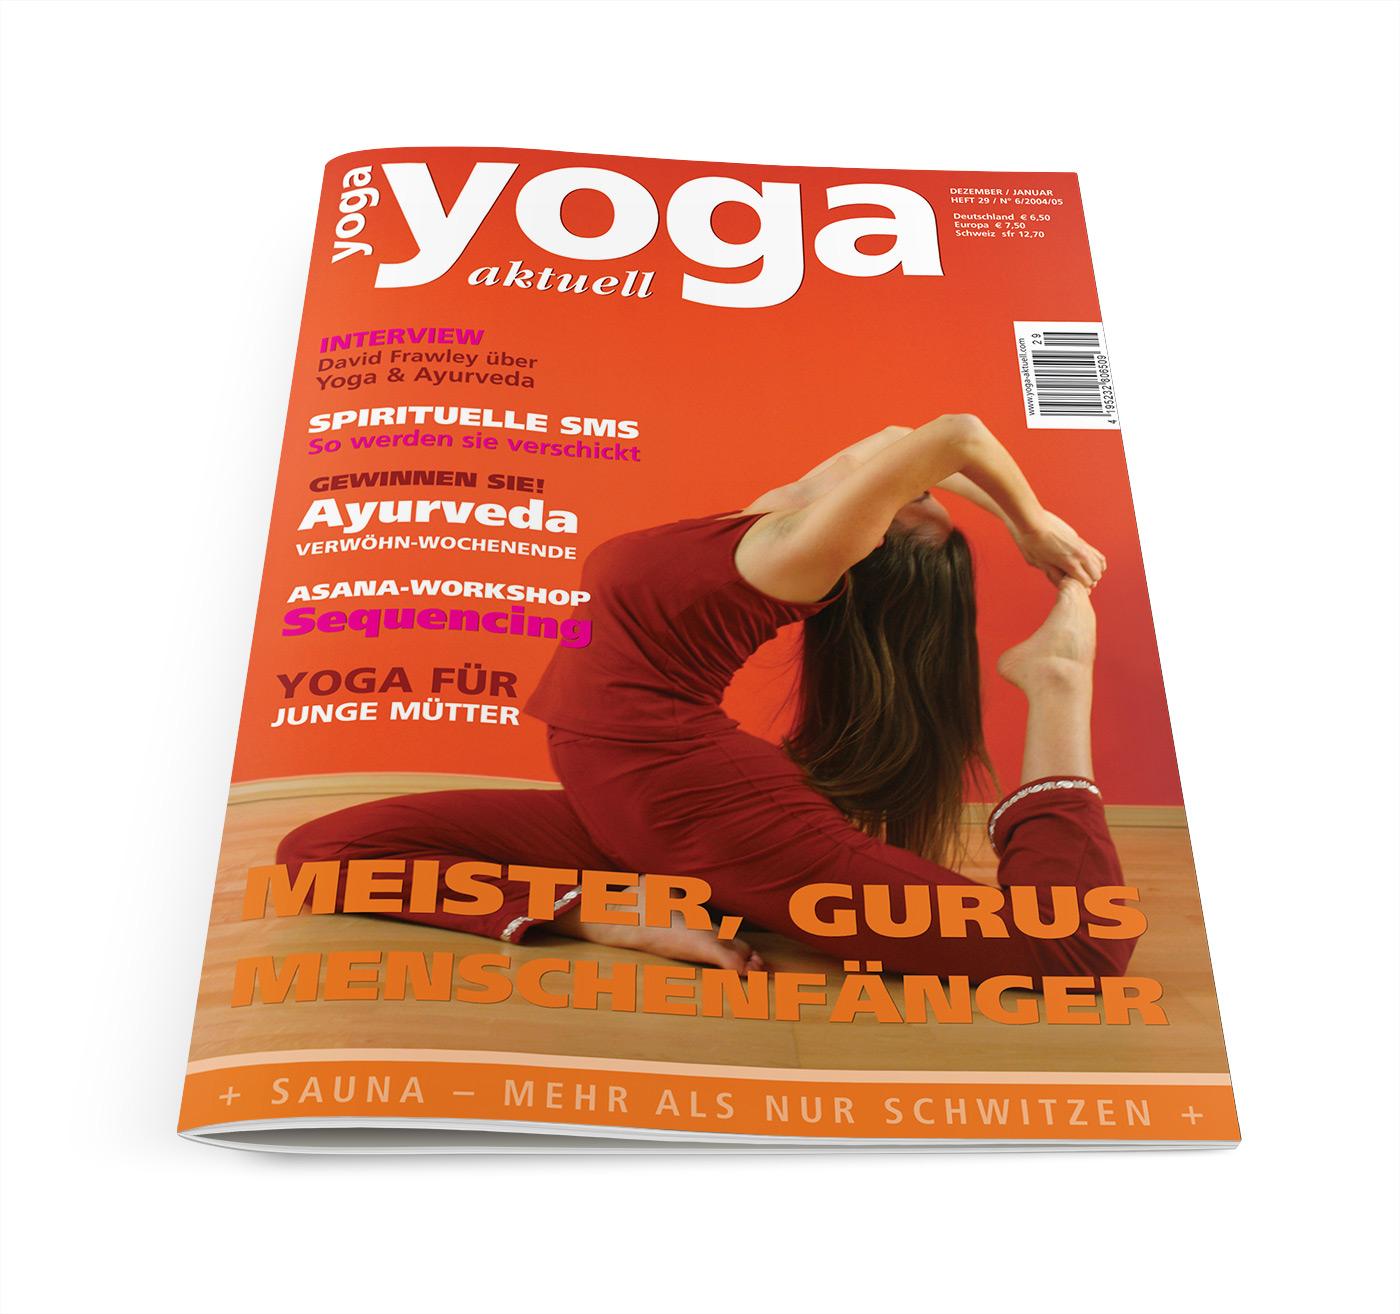 Yoga Aktuell 29 - 06/2004